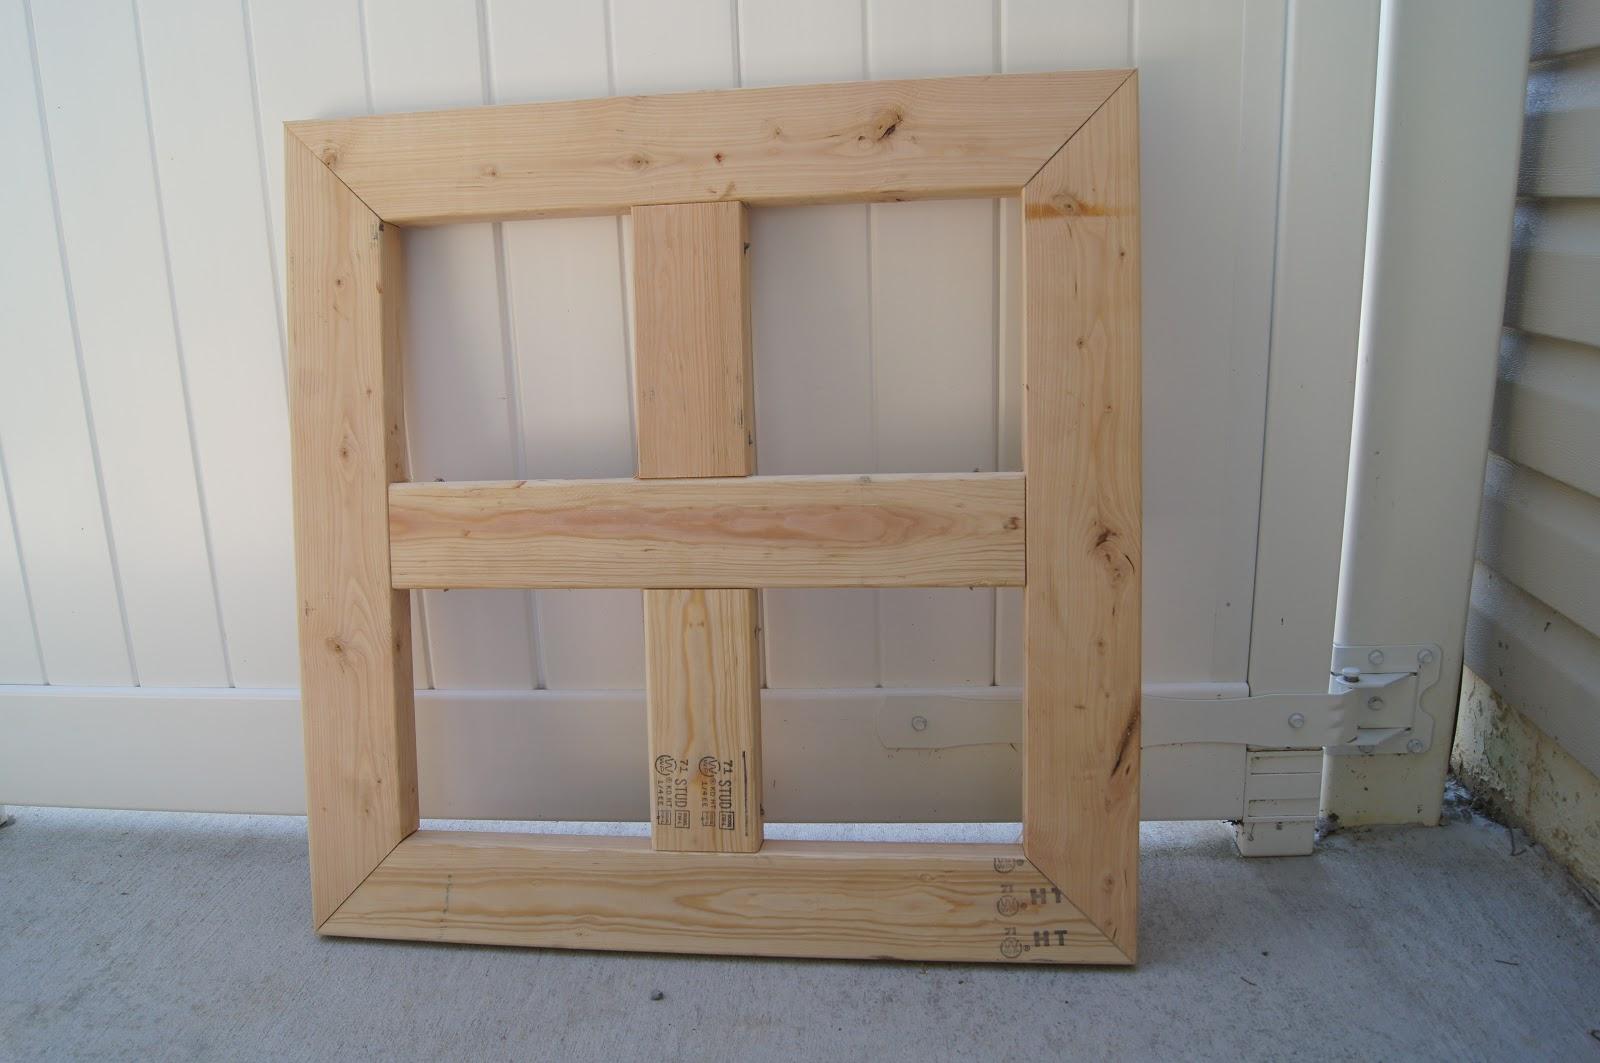 Diy Crate Coffee Table Diy crate coffee table